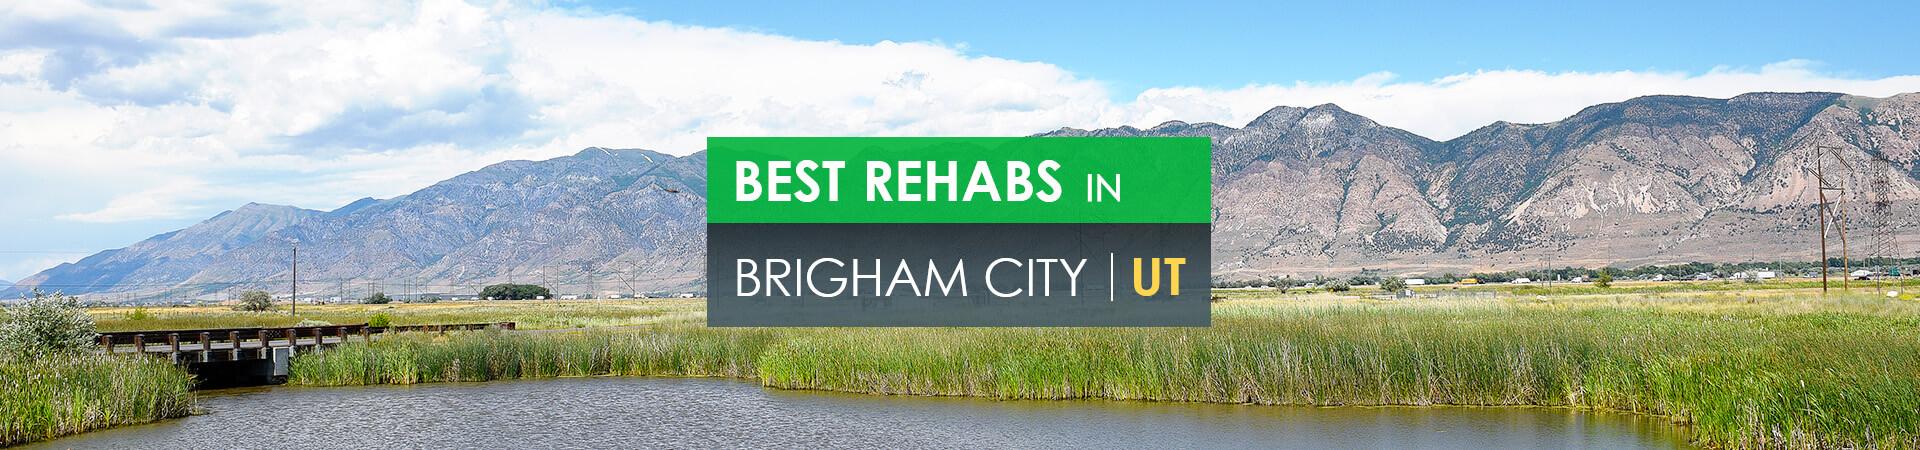 Best rehabs in Brigham City, UT